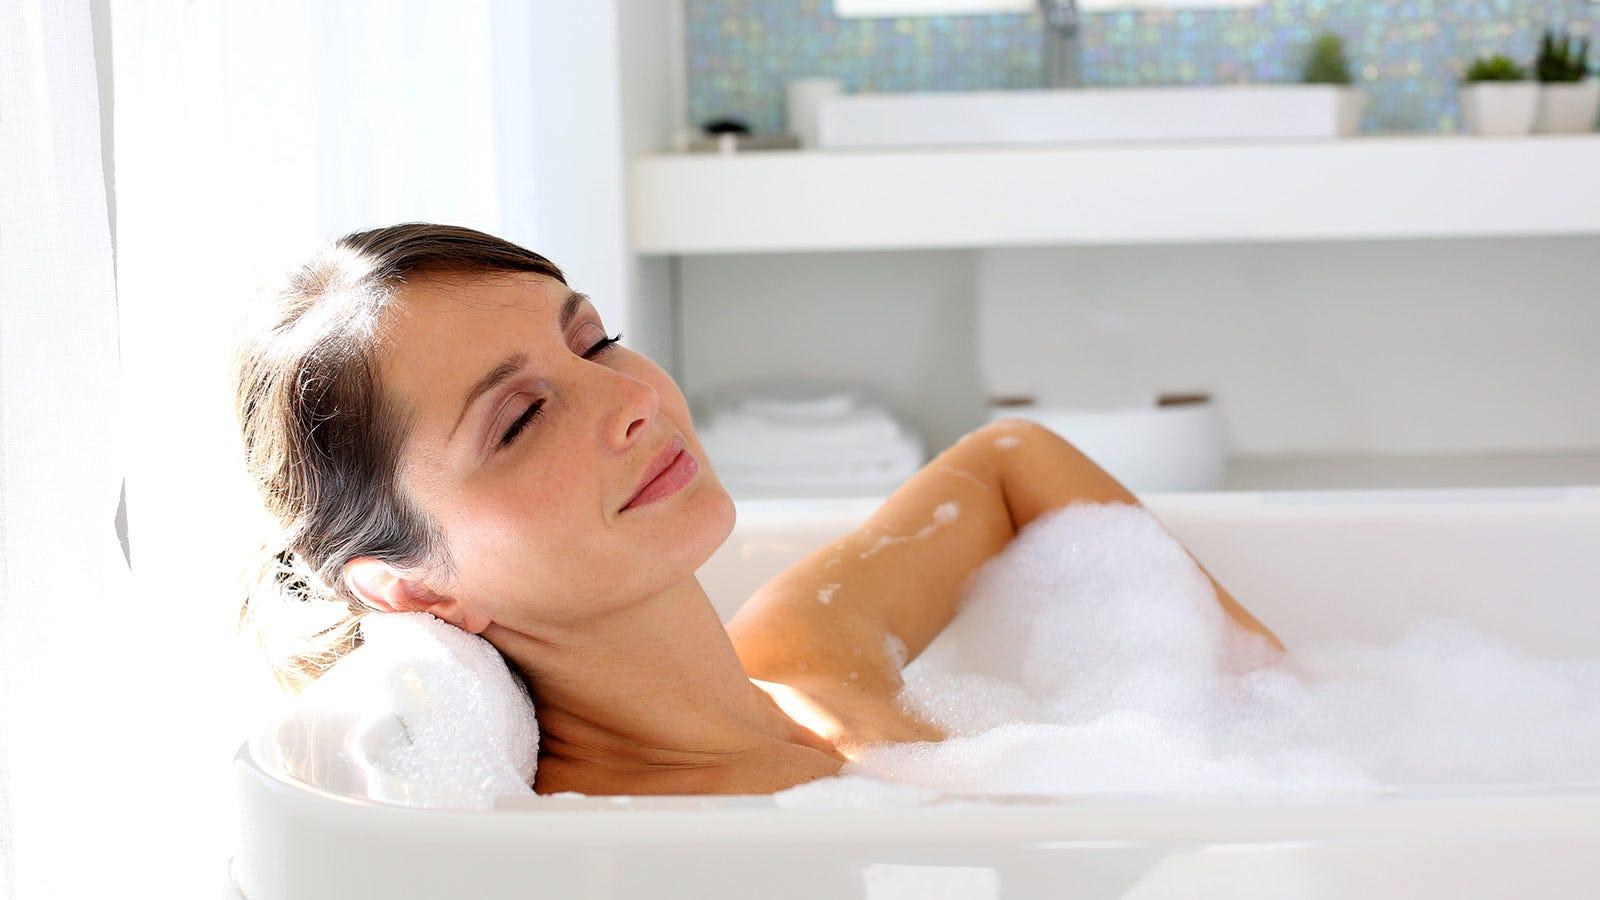 A woman relaxing in a bubble bath.